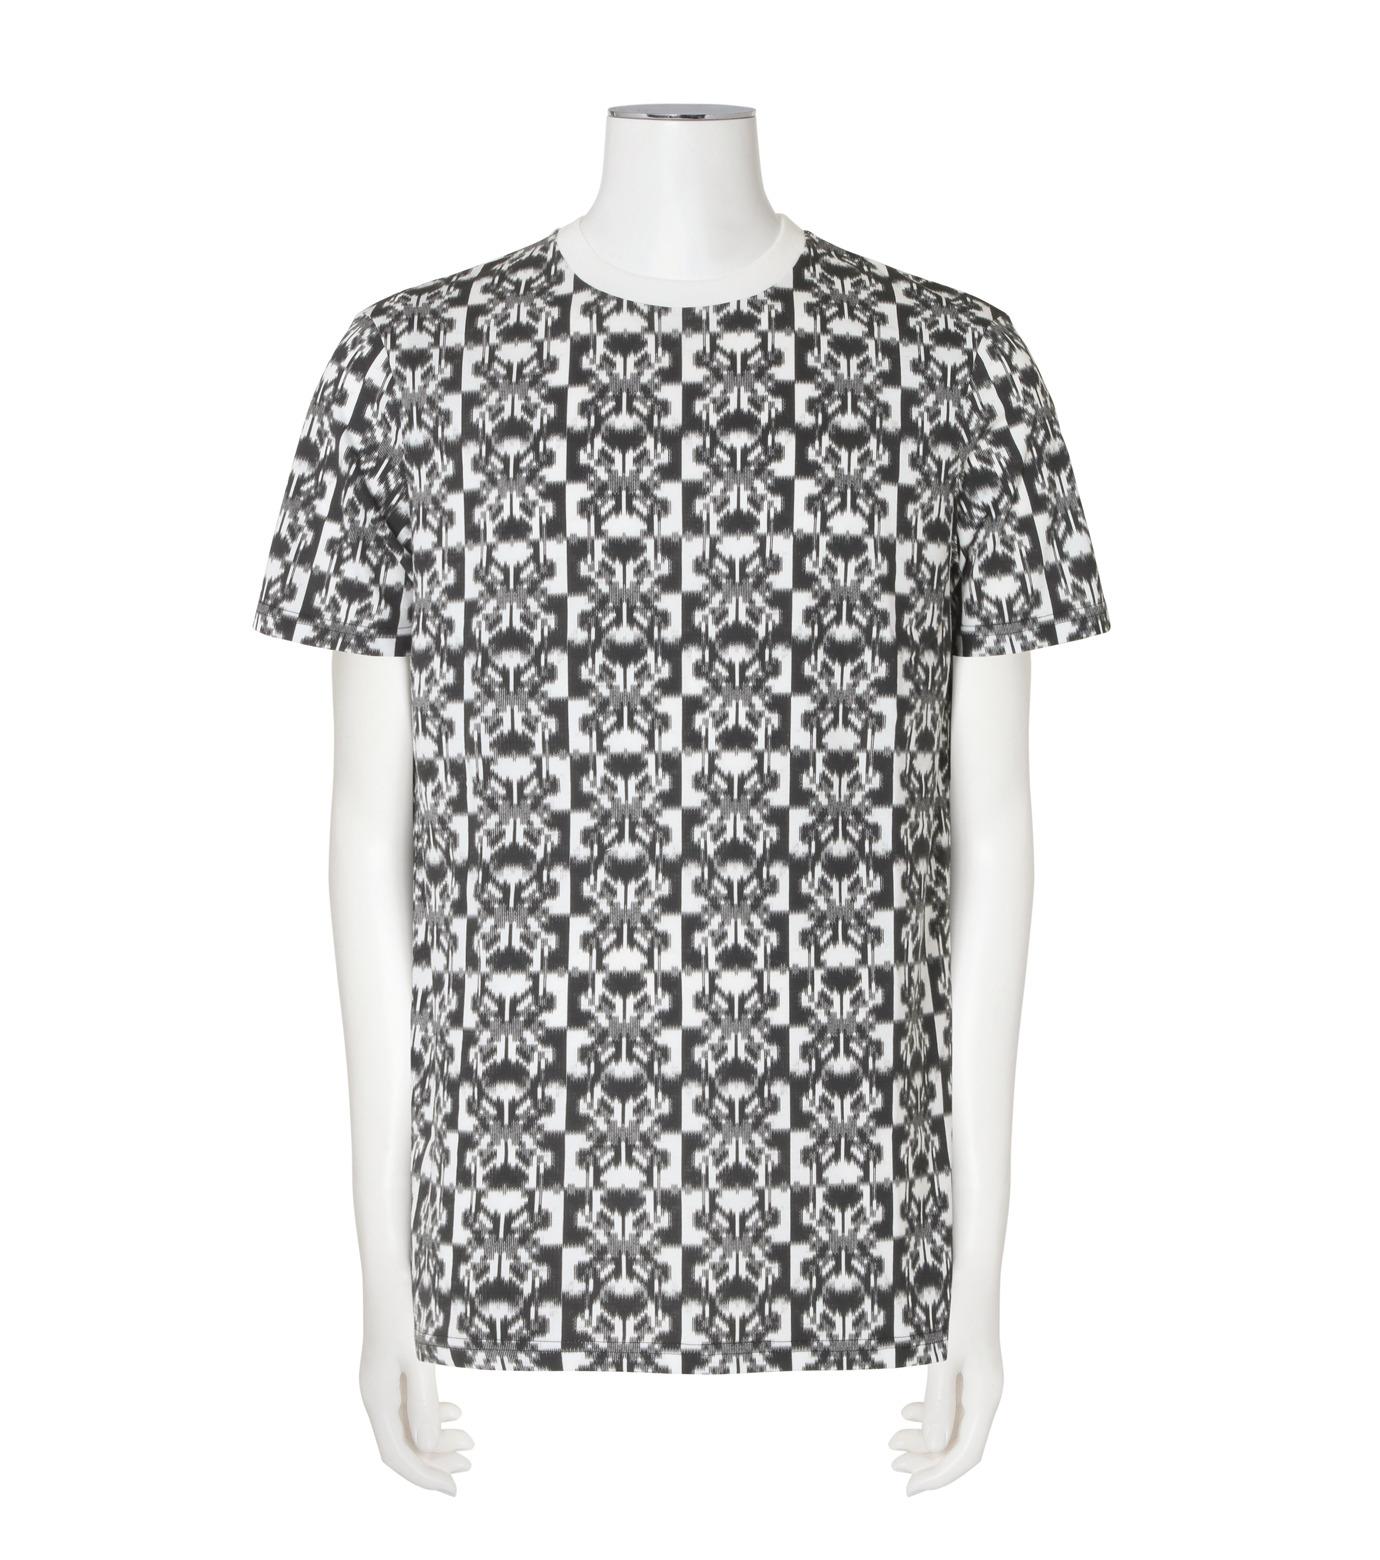 Dior Homme(ディオール オム)のPattern T-WHITE(カットソー/cut and sewn)-633J654I0111-4 拡大詳細画像1